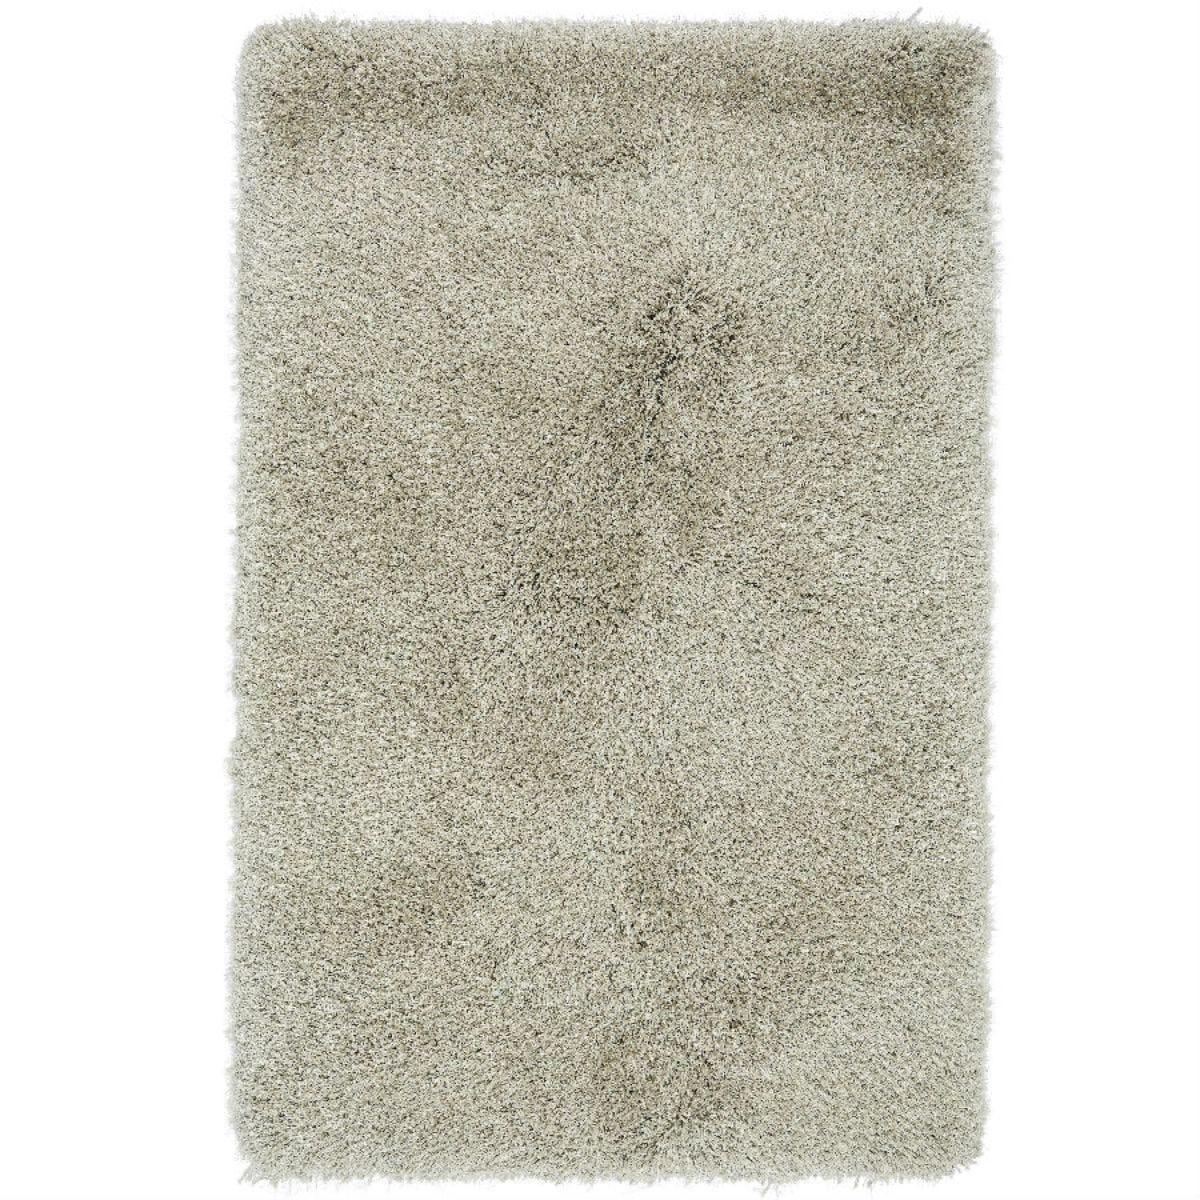 Asiatic Cascade Rug, 170 x 120cm - Sand